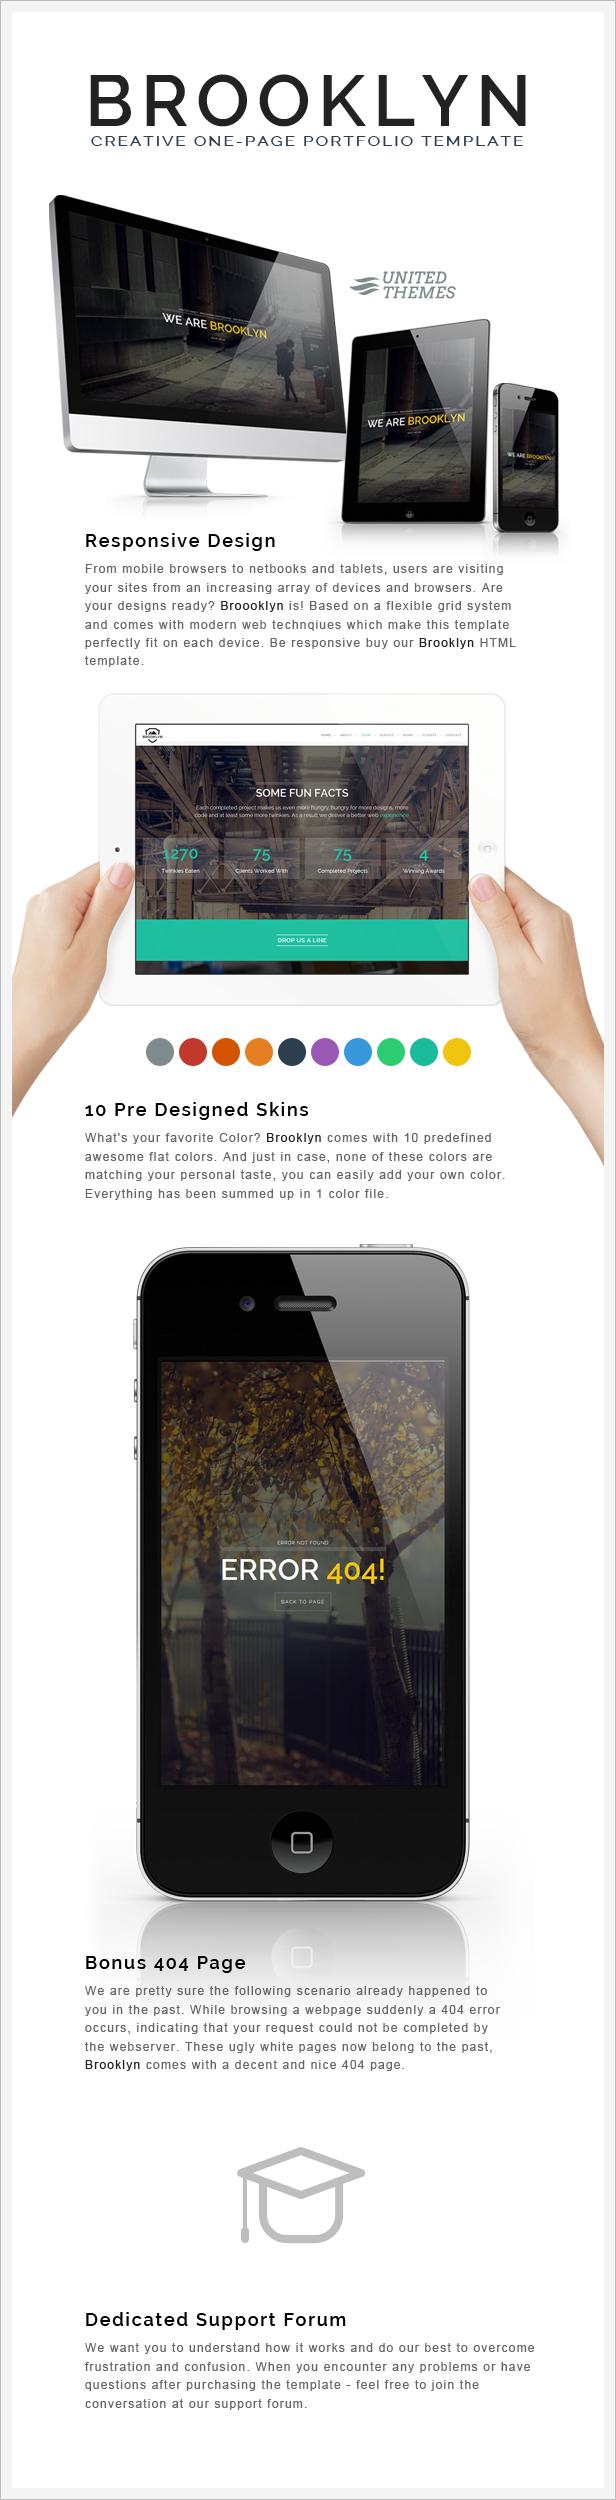 Brooklyn - Creative Portfolio Page HTML by UnitedThemes   ThemeForest